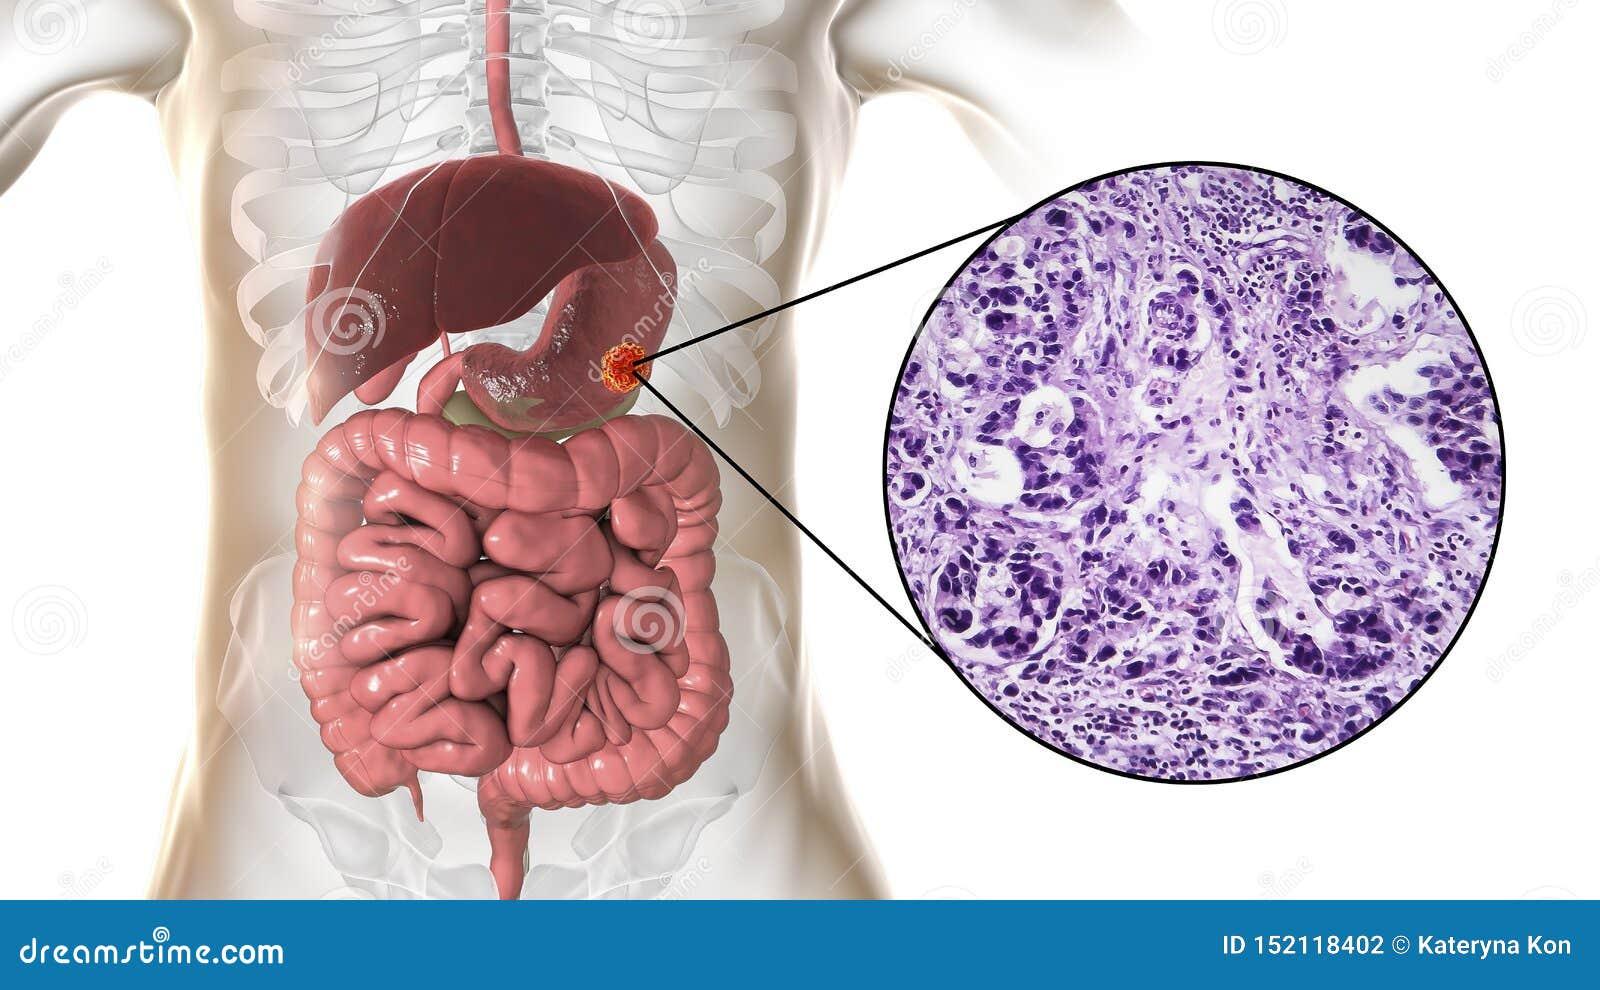 gastric cancer or adenocarcinoma)